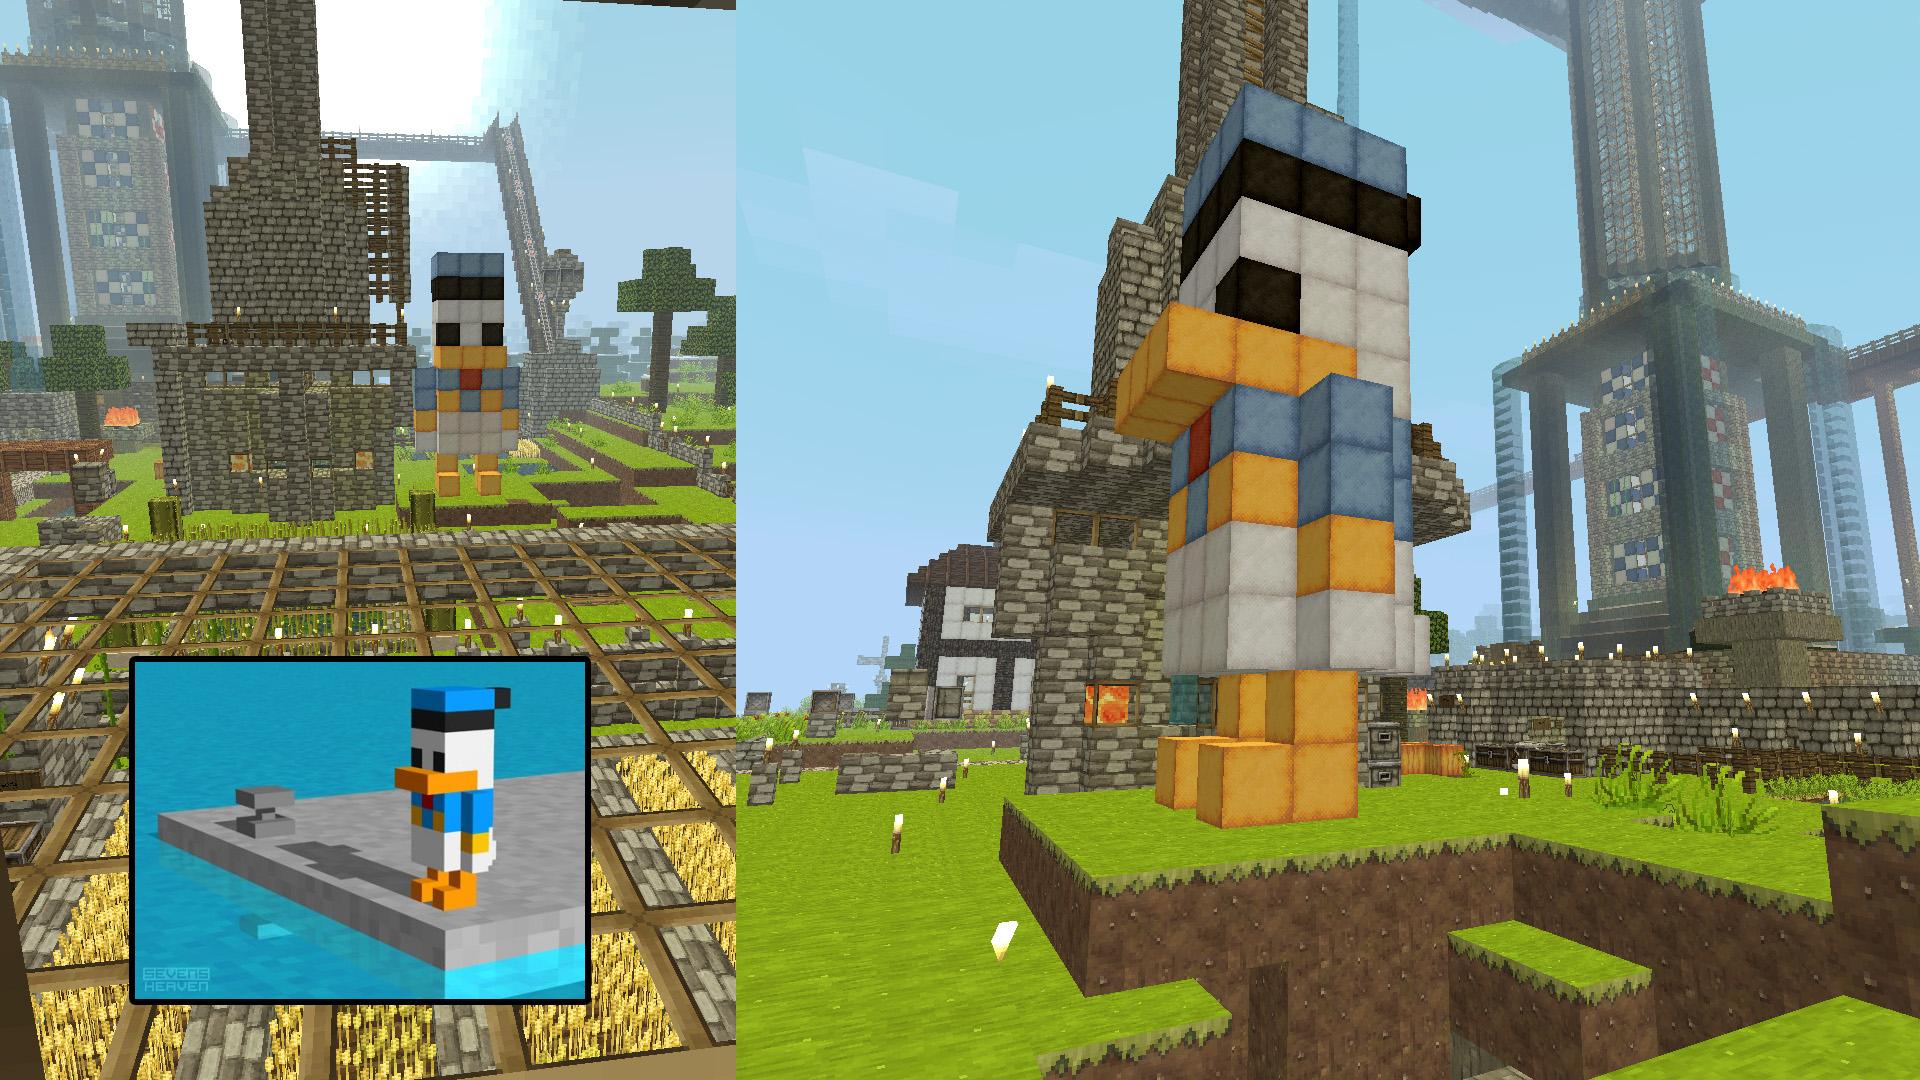 Minecraft 3d Donald Duck Pixel Art By Shadowdame On Deviantart